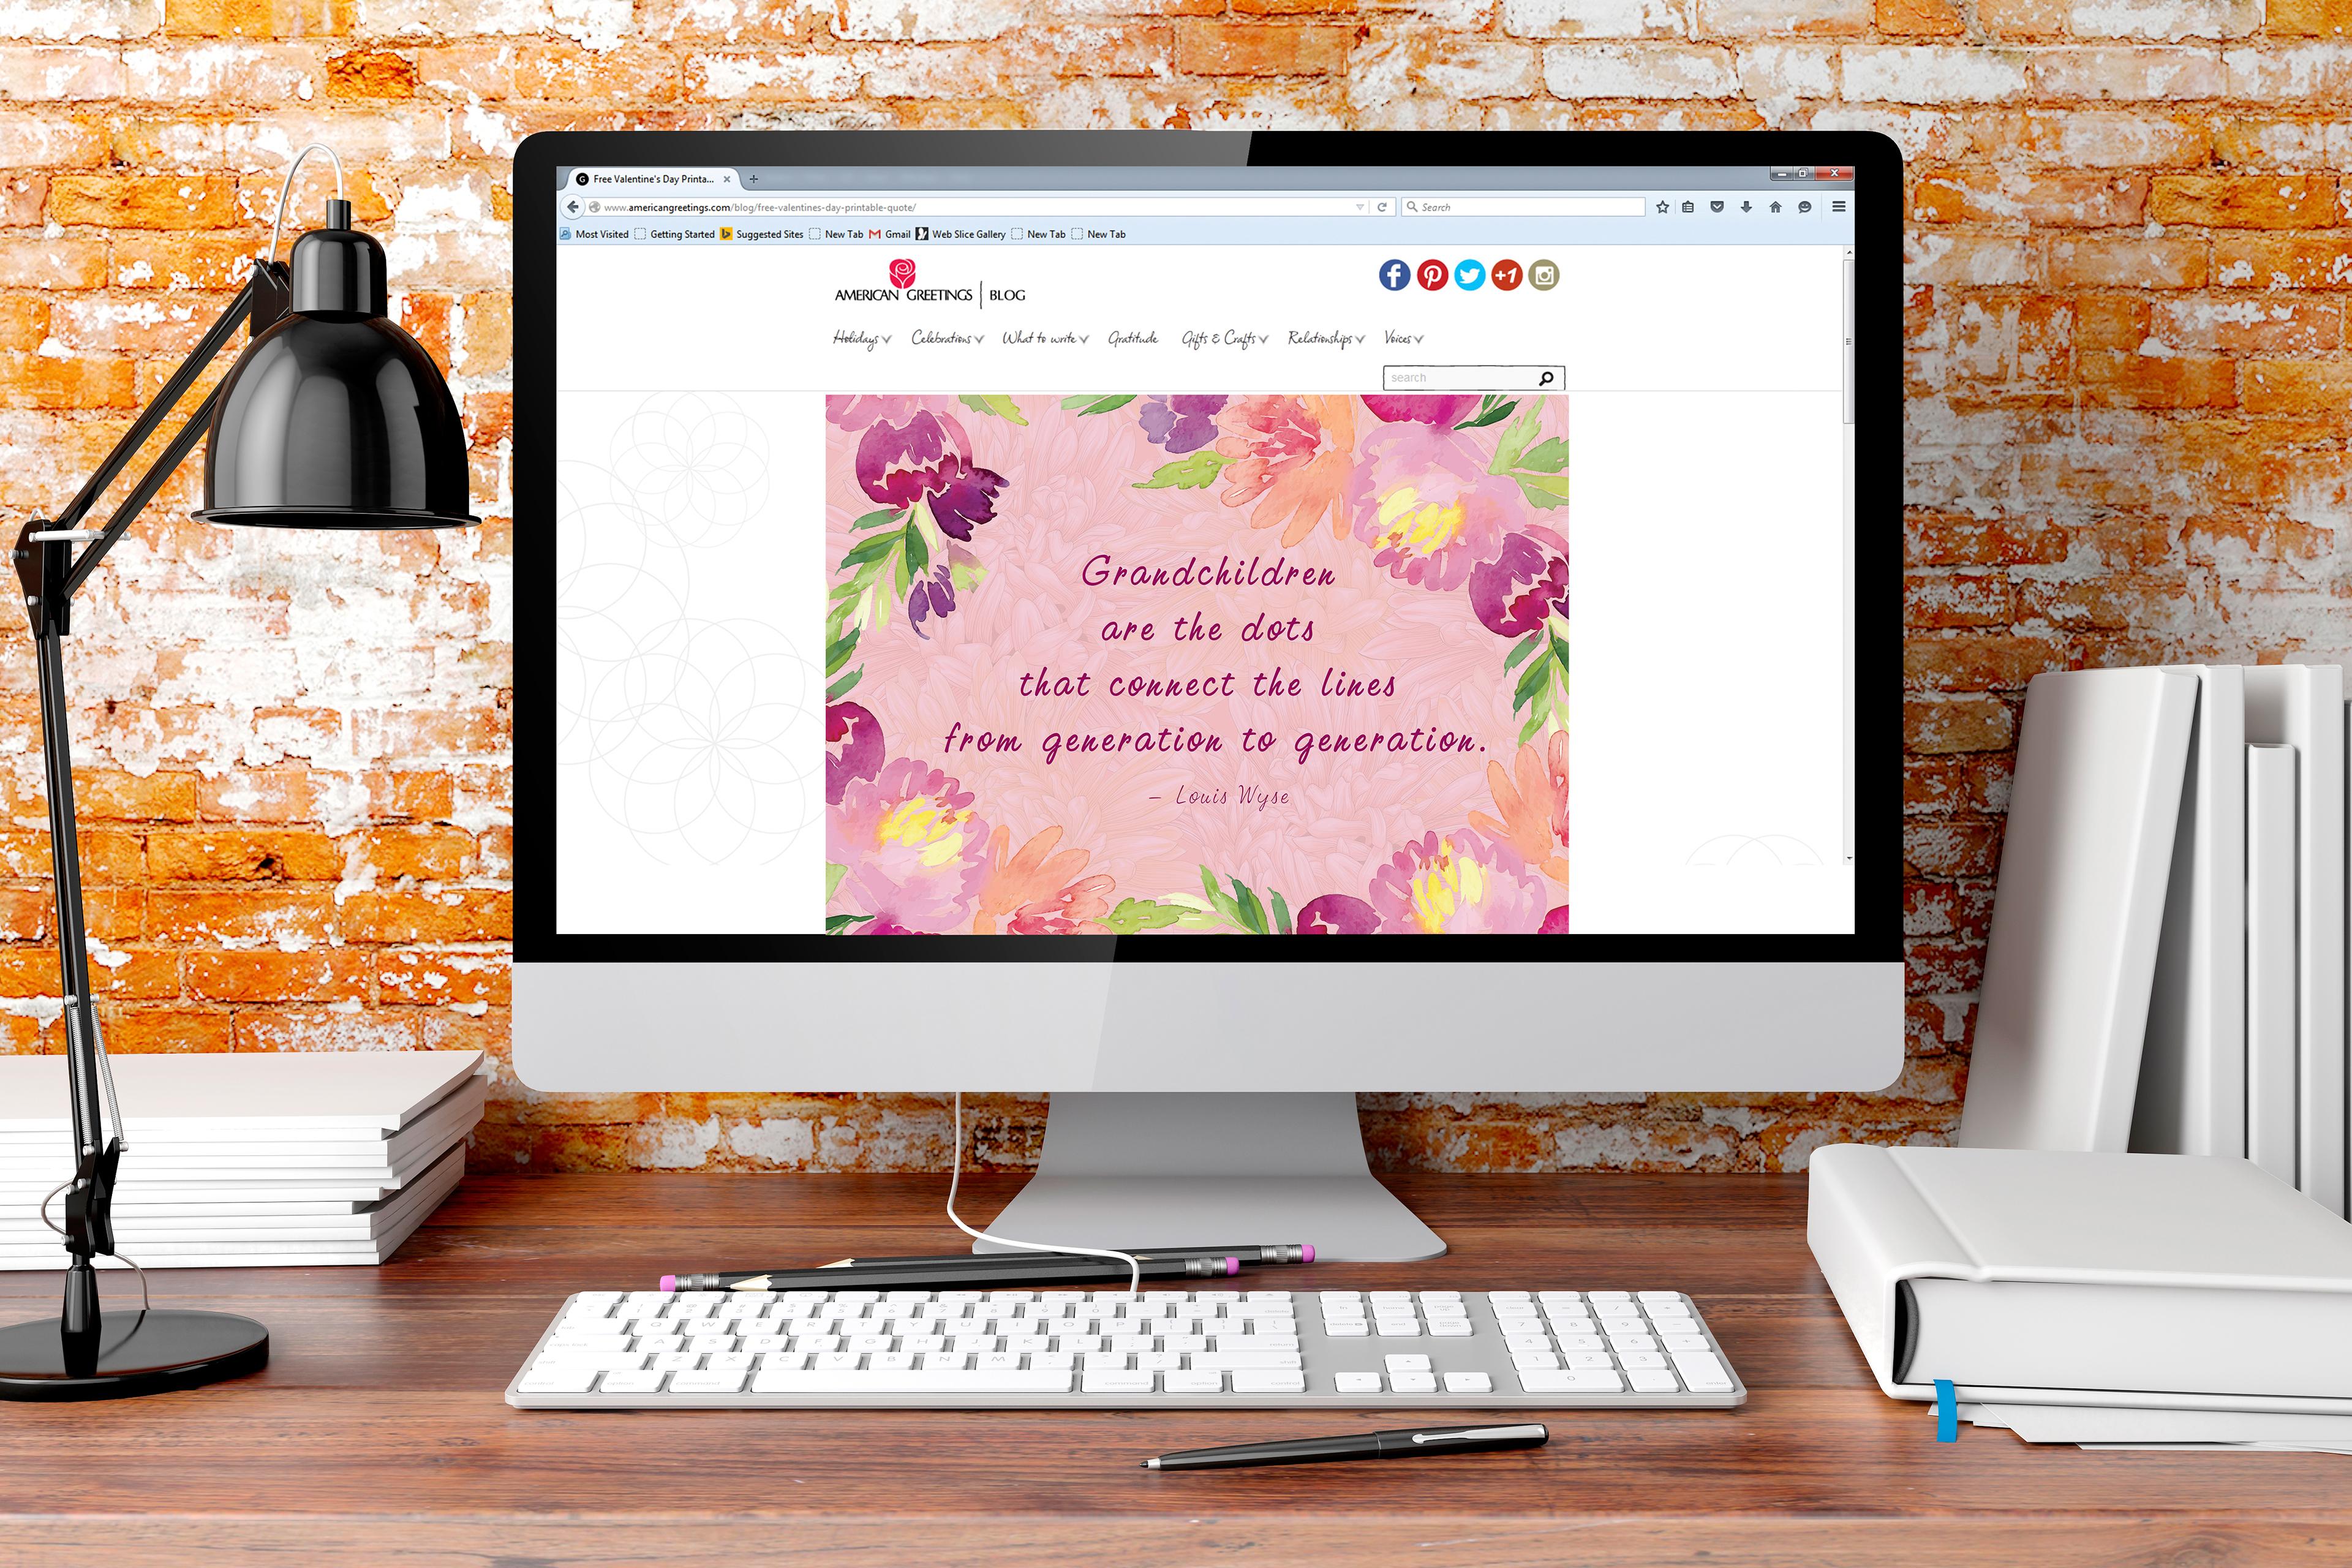 American Greetings Blog On Behance